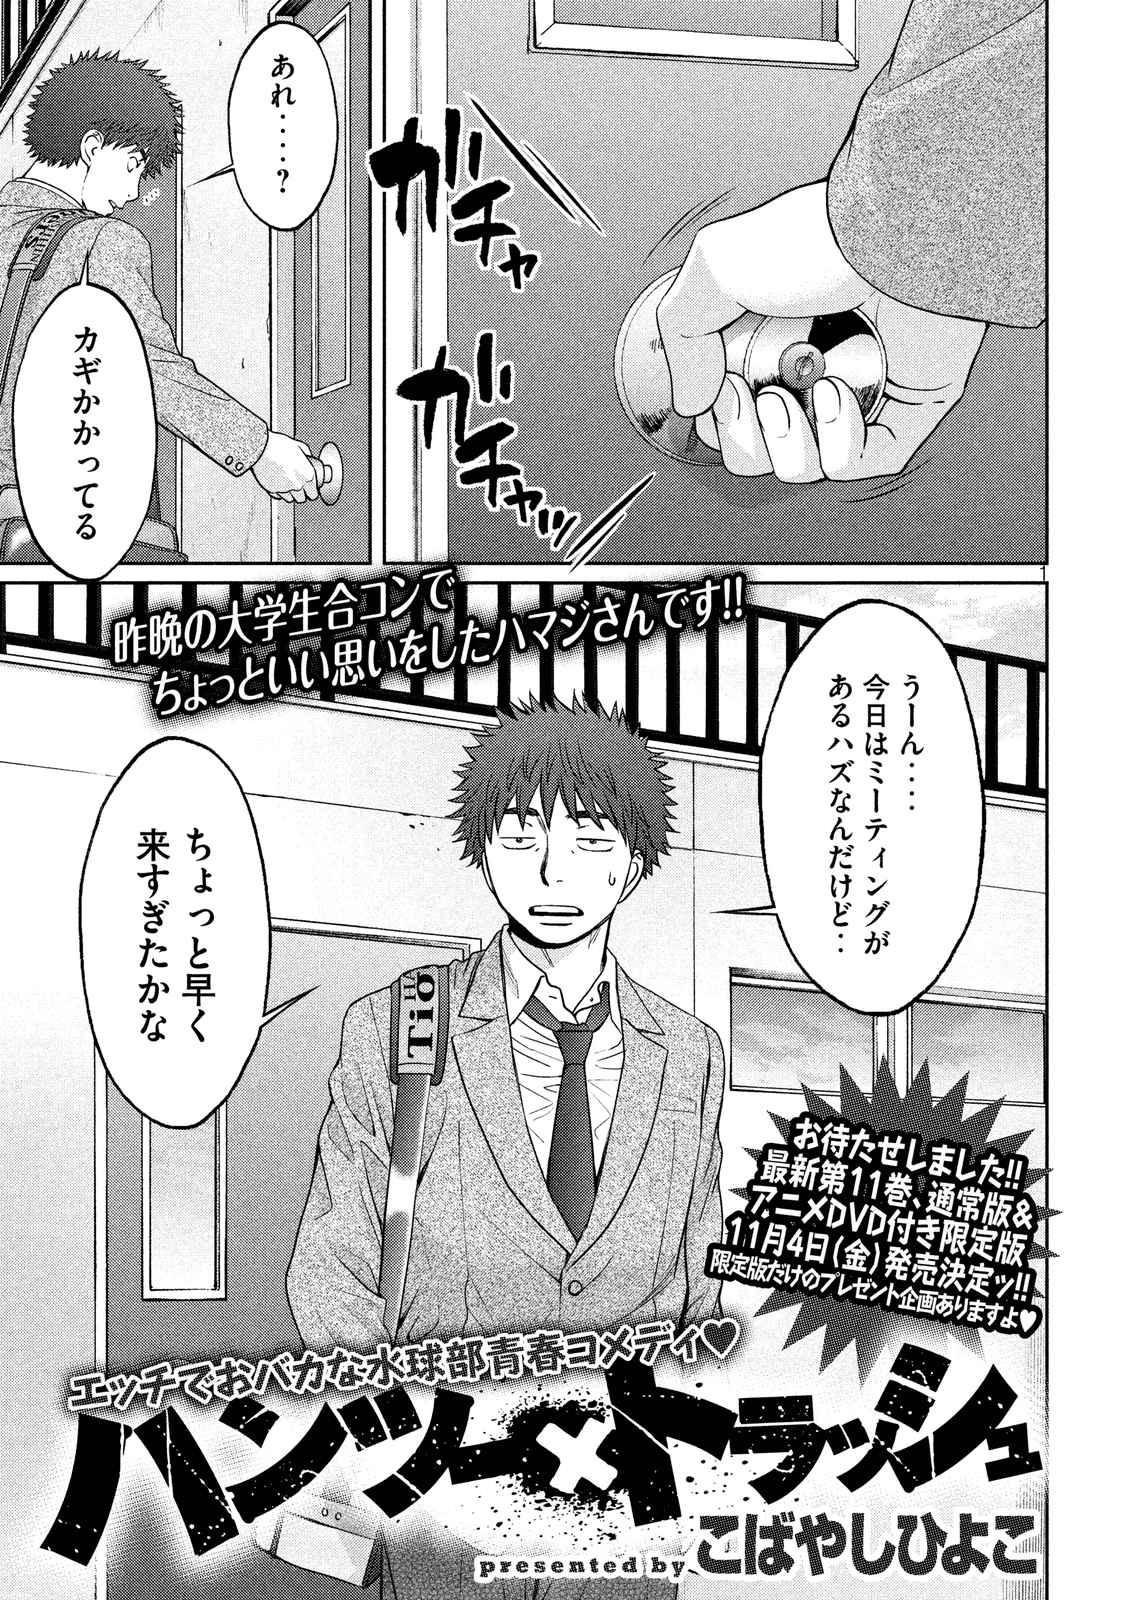 Hantsu_x_Trash Chapter 124 Page 1